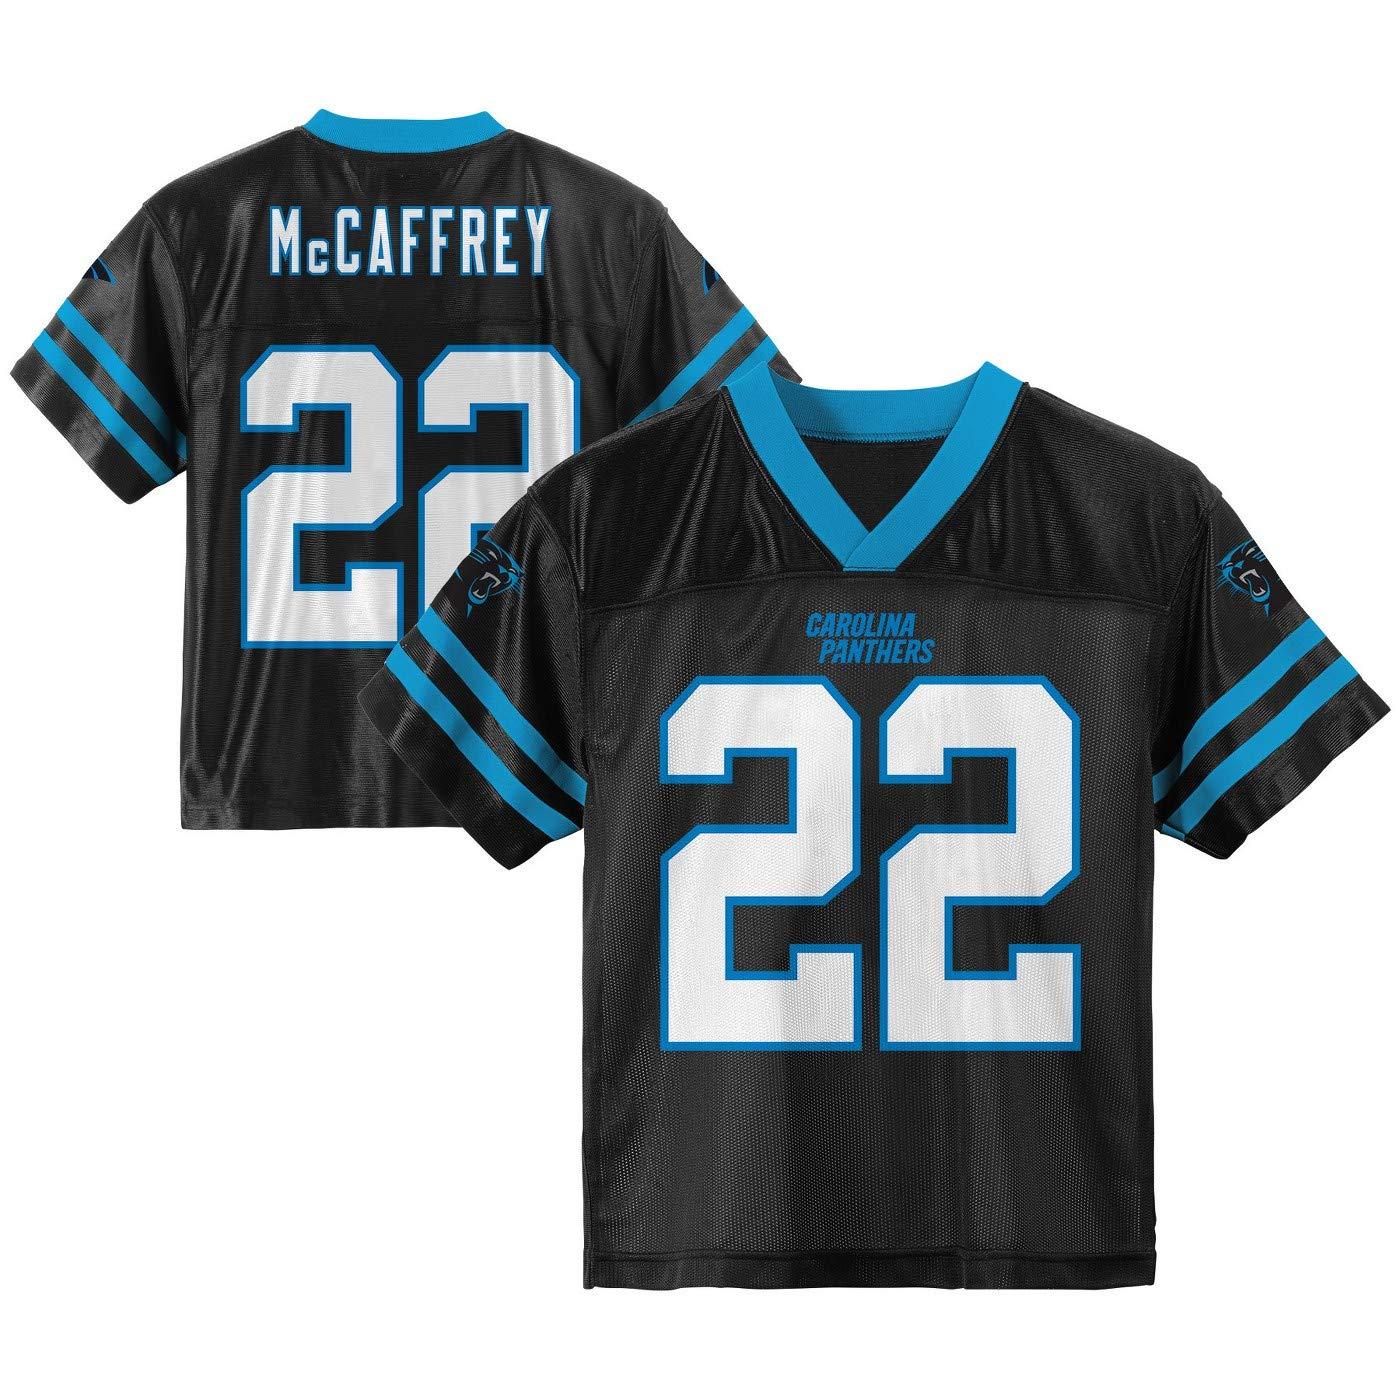 outlet store 8f0d1 e5d5a Outerstuff Christian McCaffrey Carolina Panthers #22 Black Toddler Home  Player Jersey